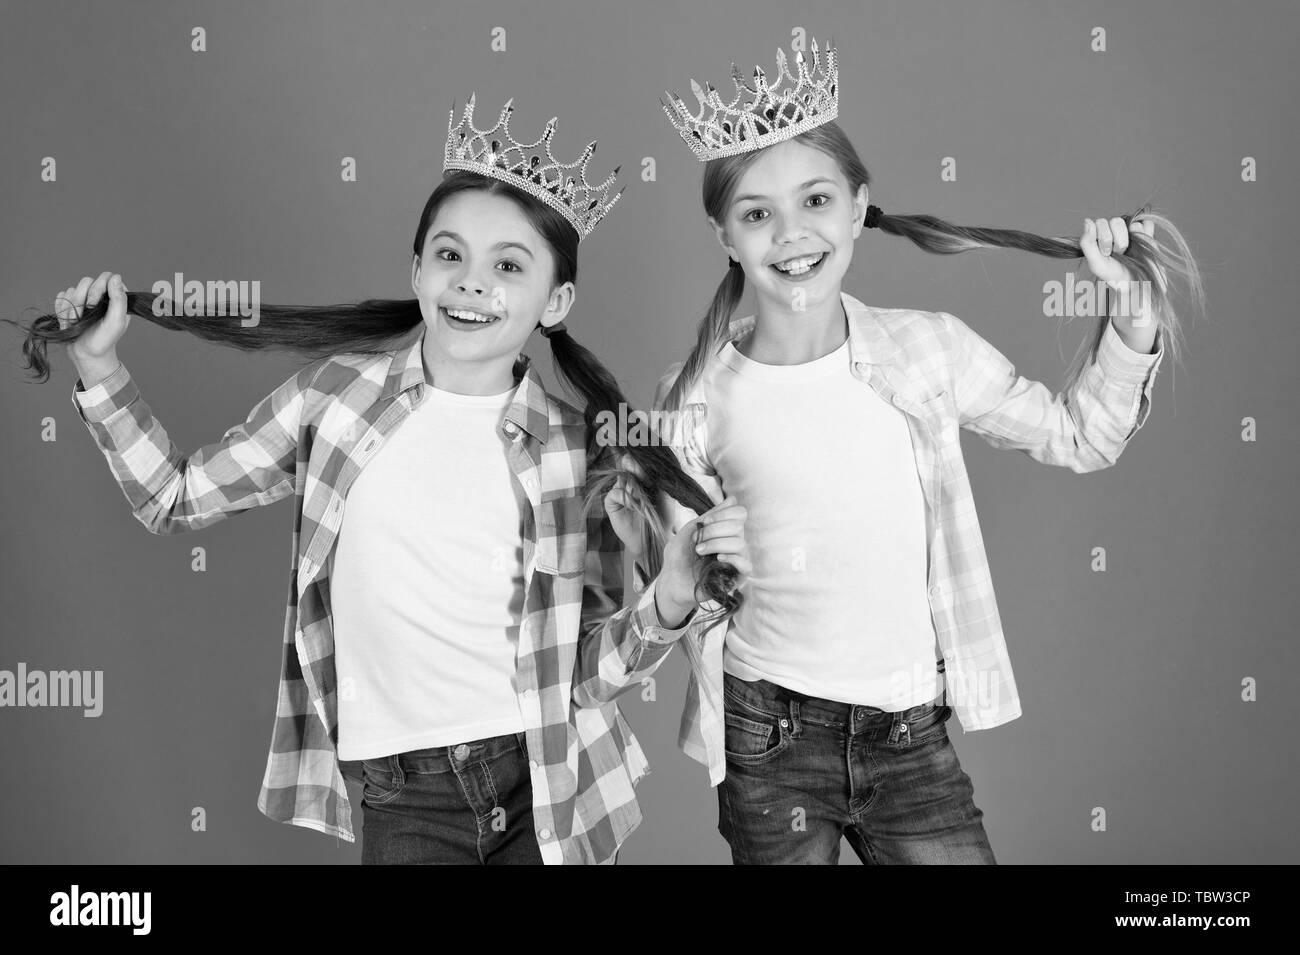 We deserve only best. Girls wear crowns. Spoiled children concept. Egocentric princess. Kids wear golden crowns symbol princess. Every girl dreaming become princess. Little princess. Happy childhood. - Stock Image